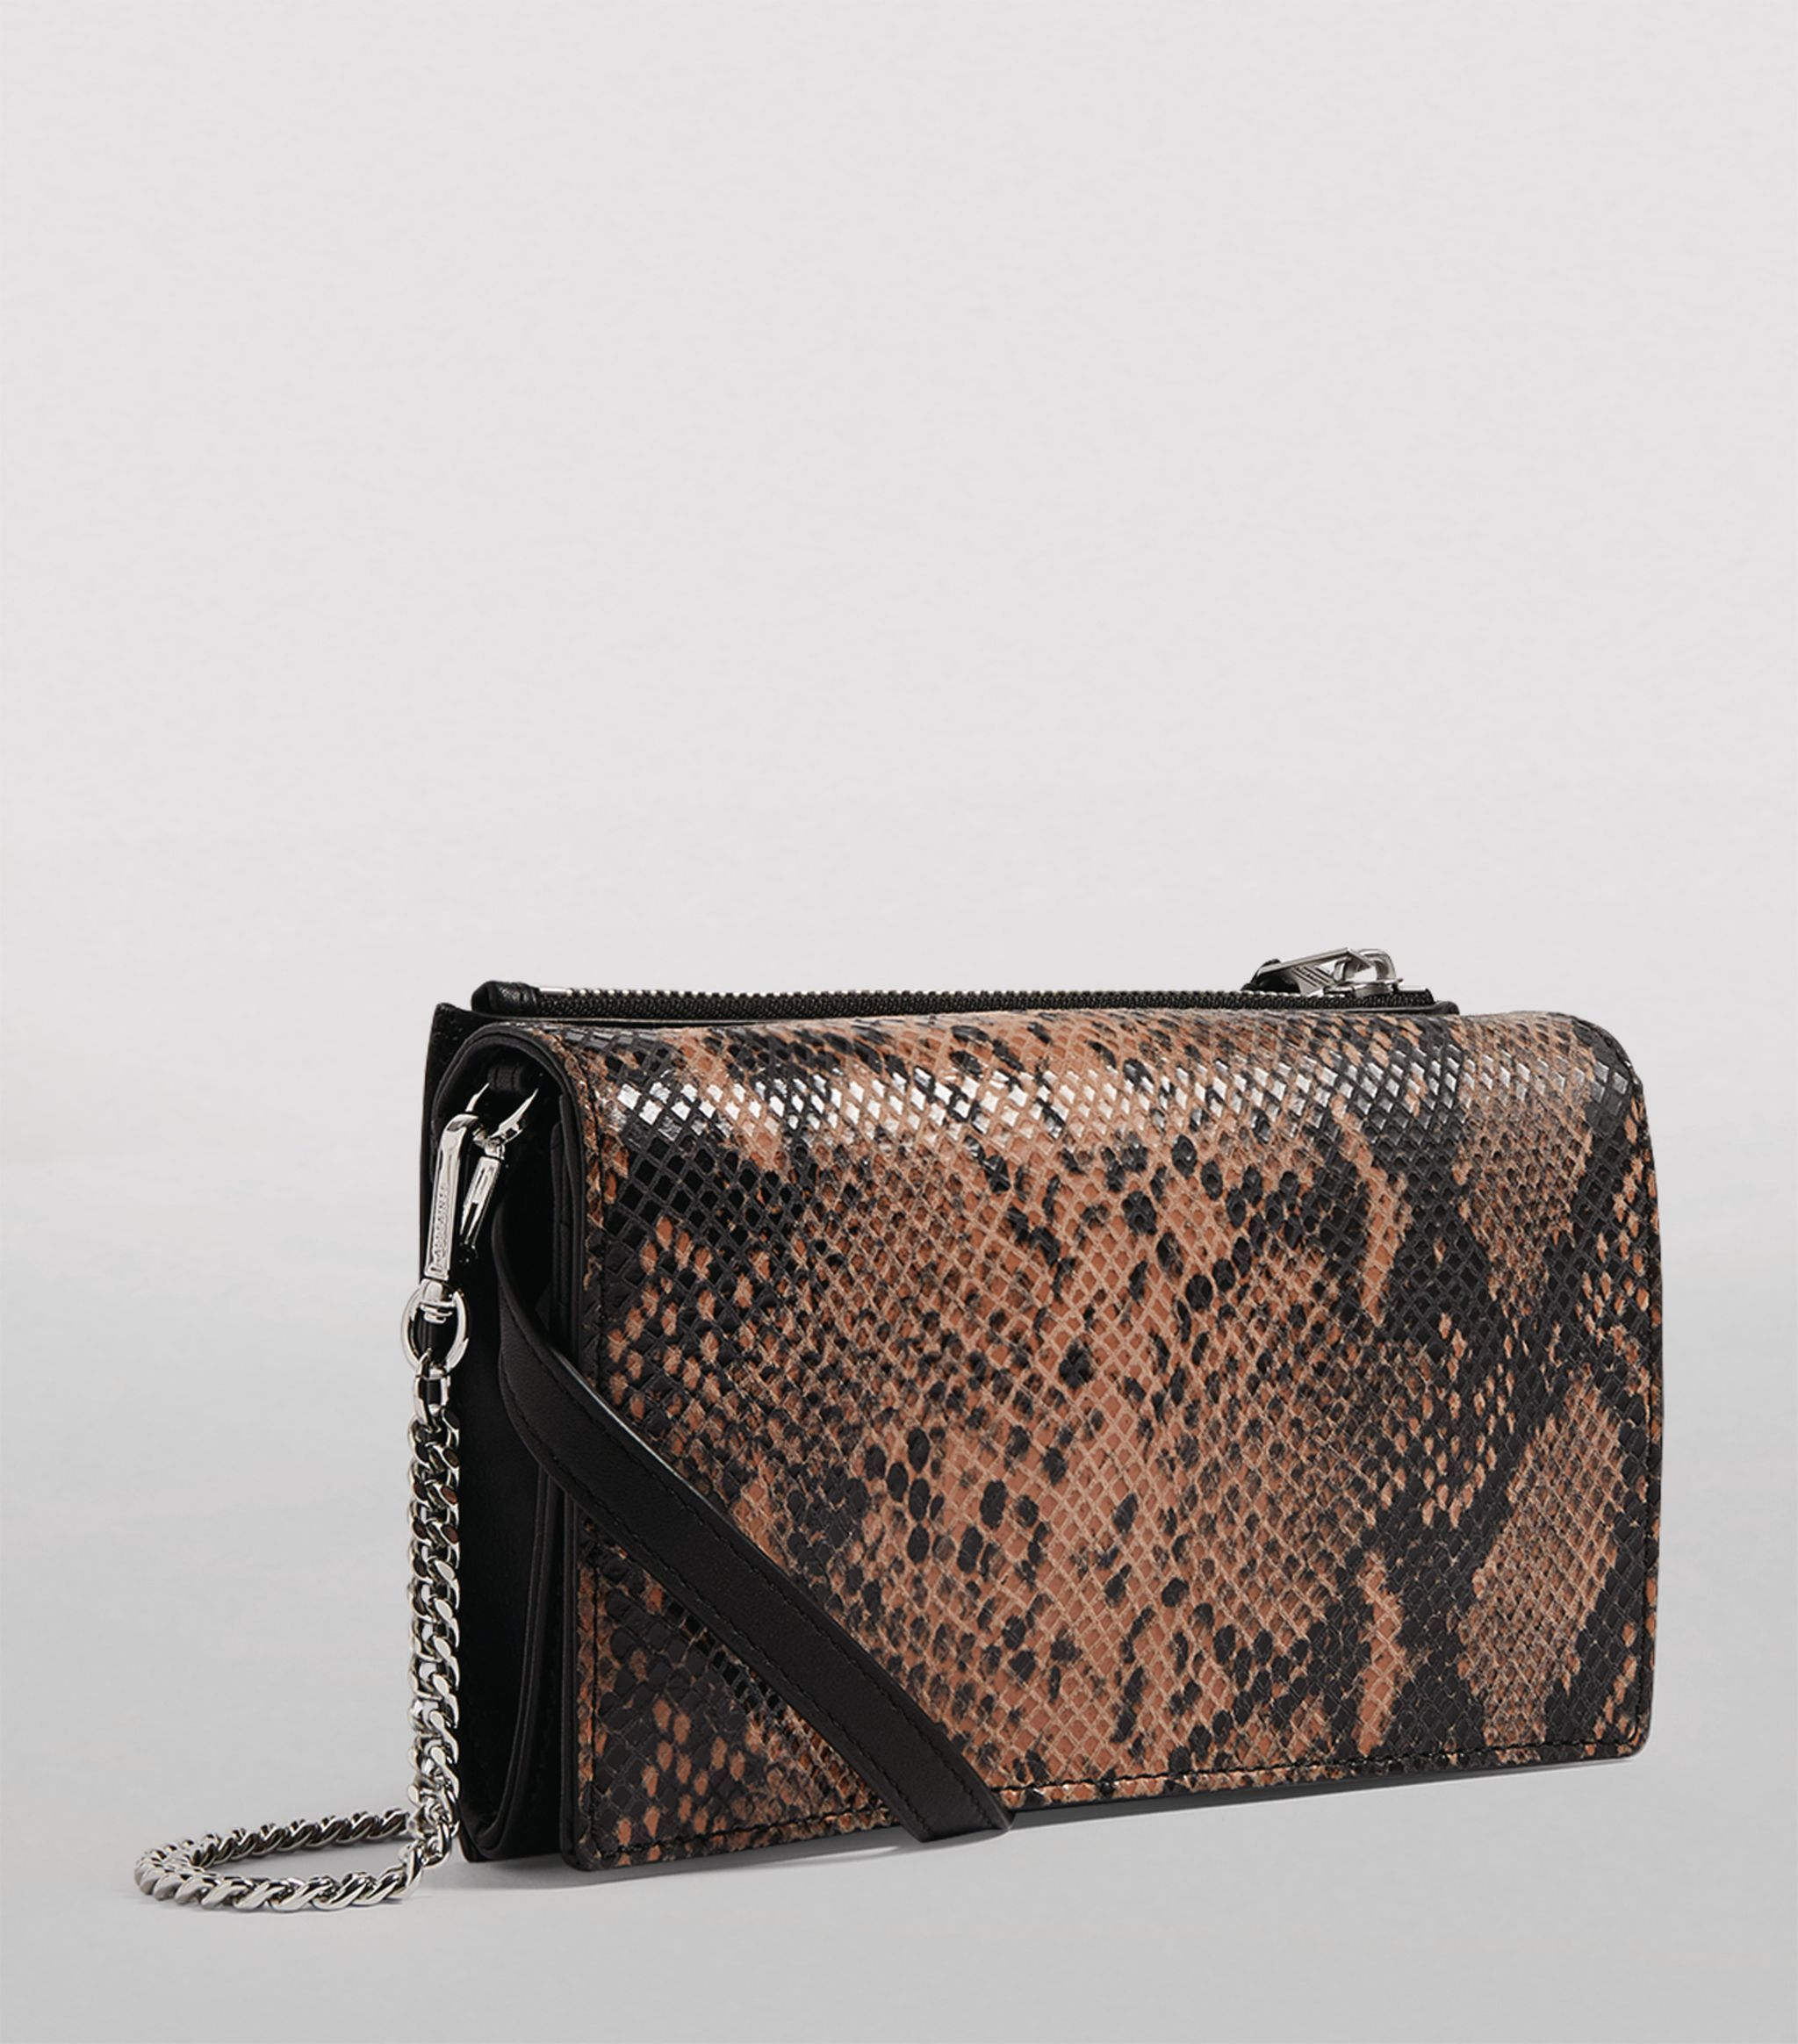 AllSaints pink Small Leather Fetch Chain Cross-Body Bag #AD , #Sponsored, #Small, #Leather, #AllSaints, #pink, #Fetch #fetch